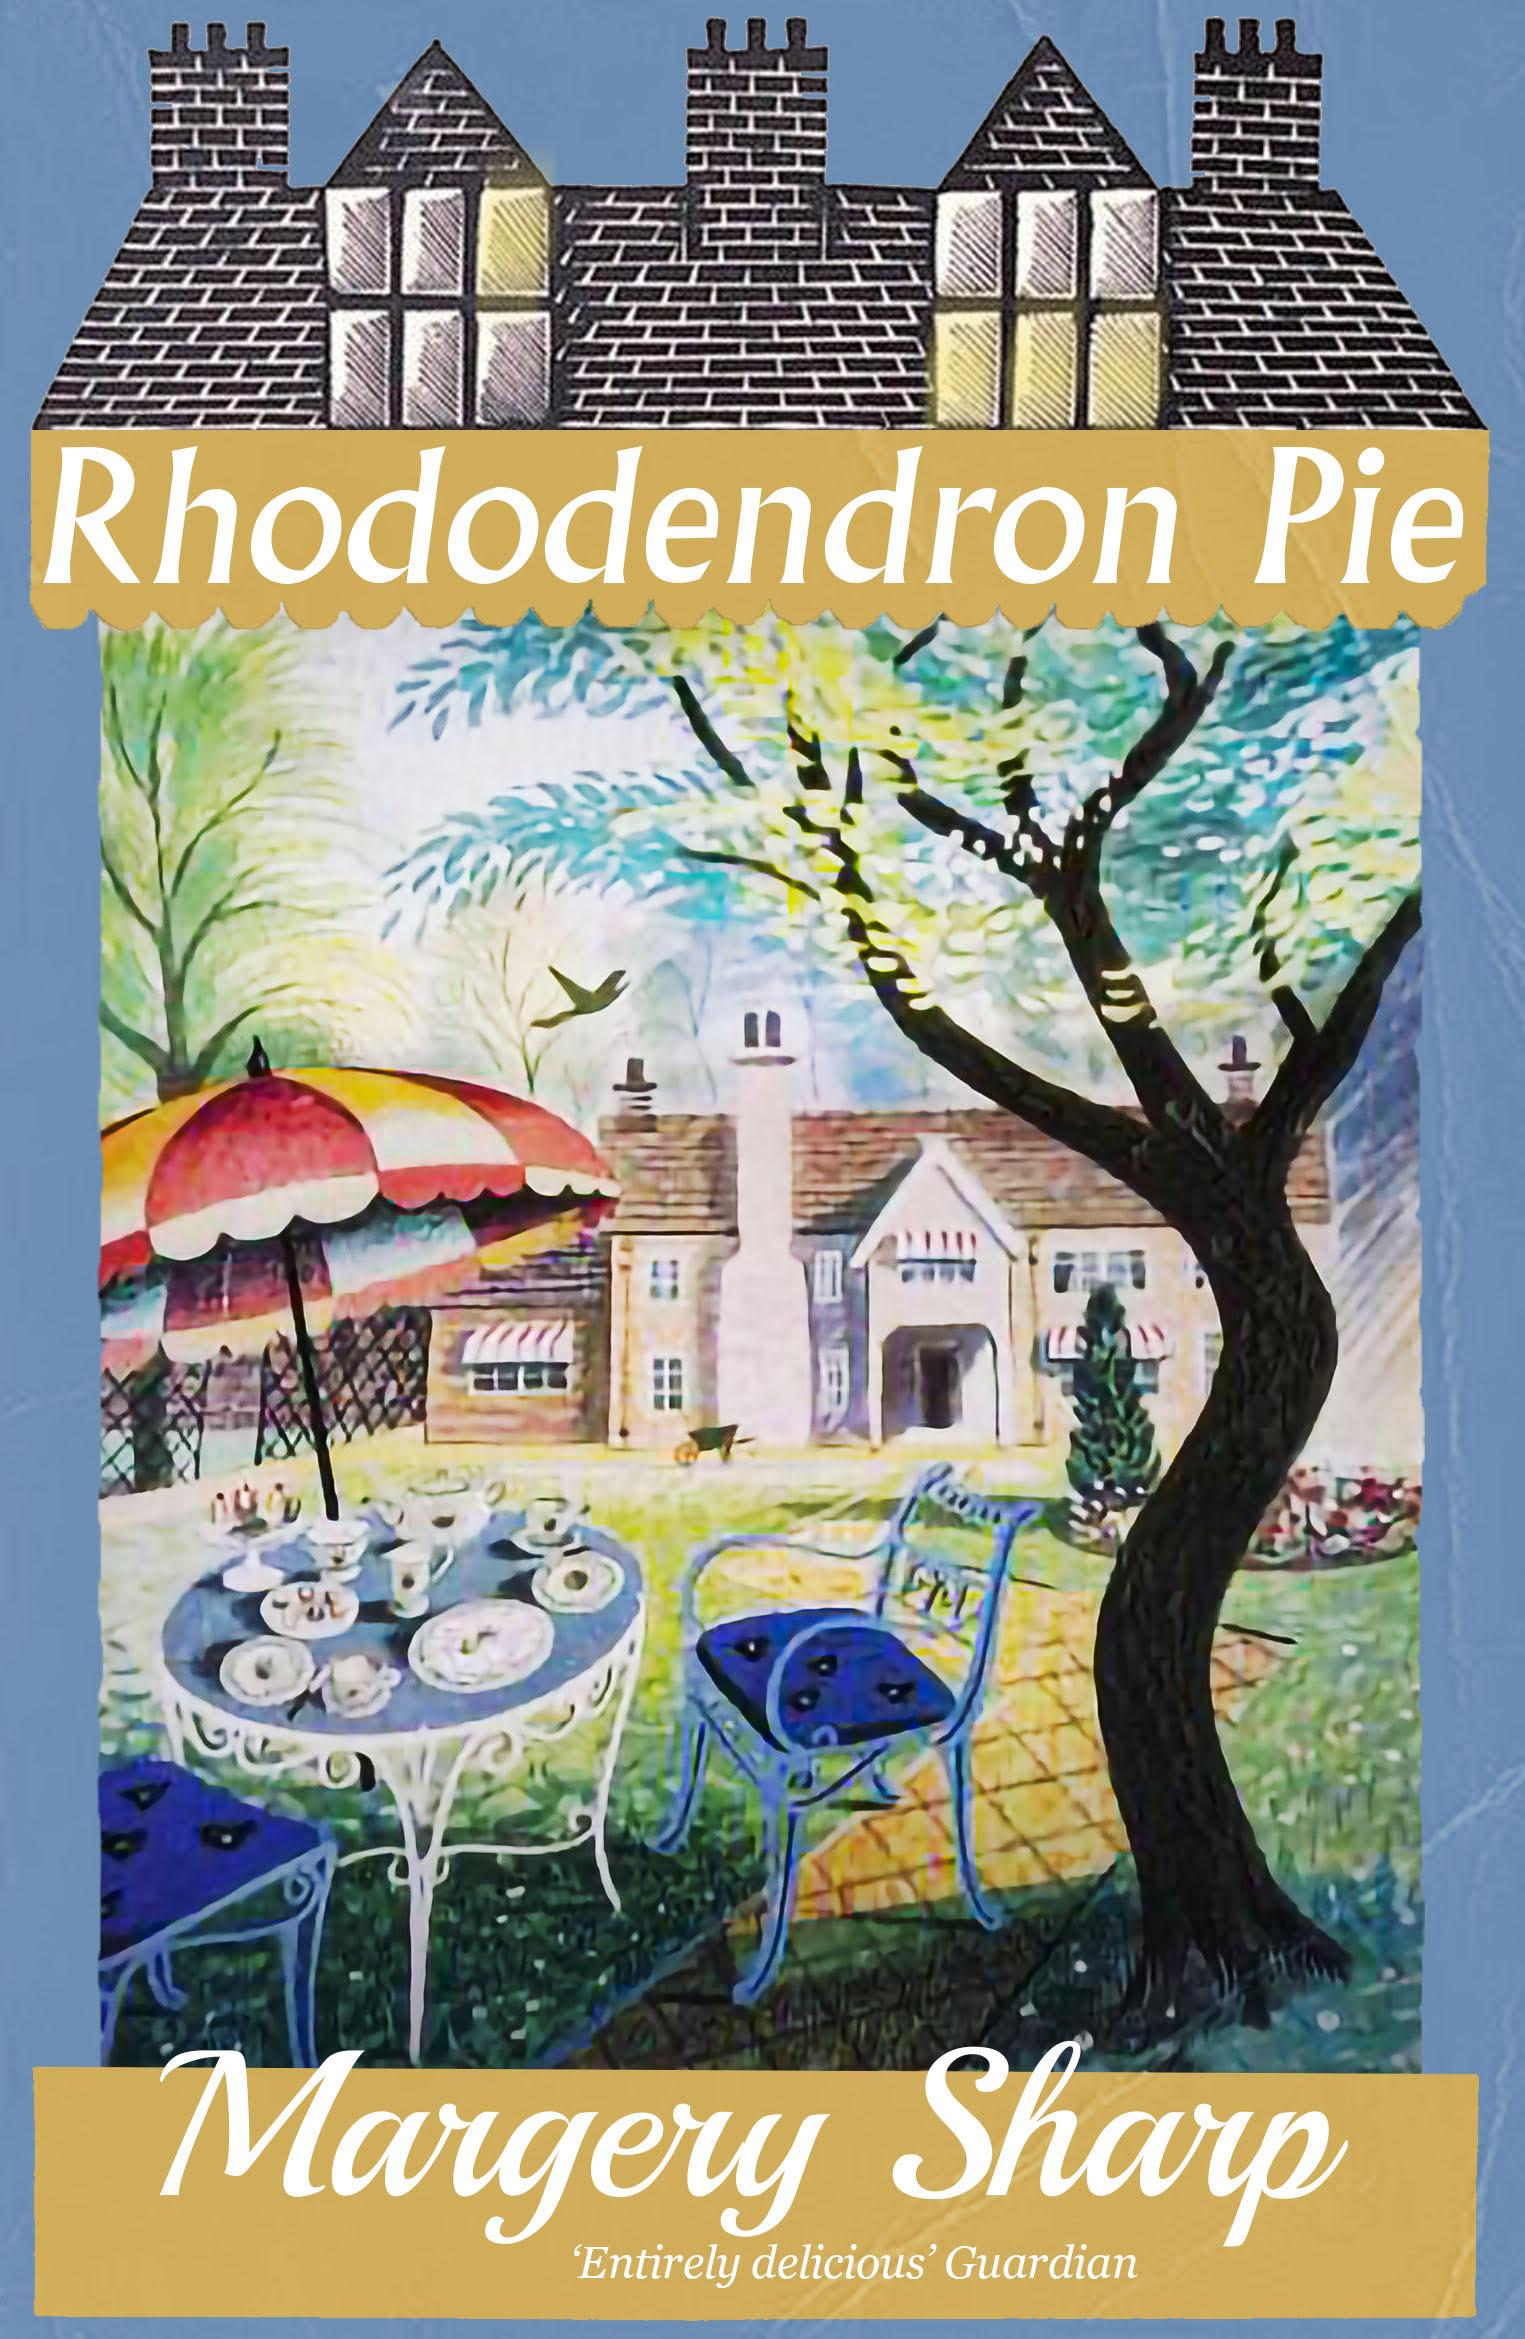 Rhododendron Pie